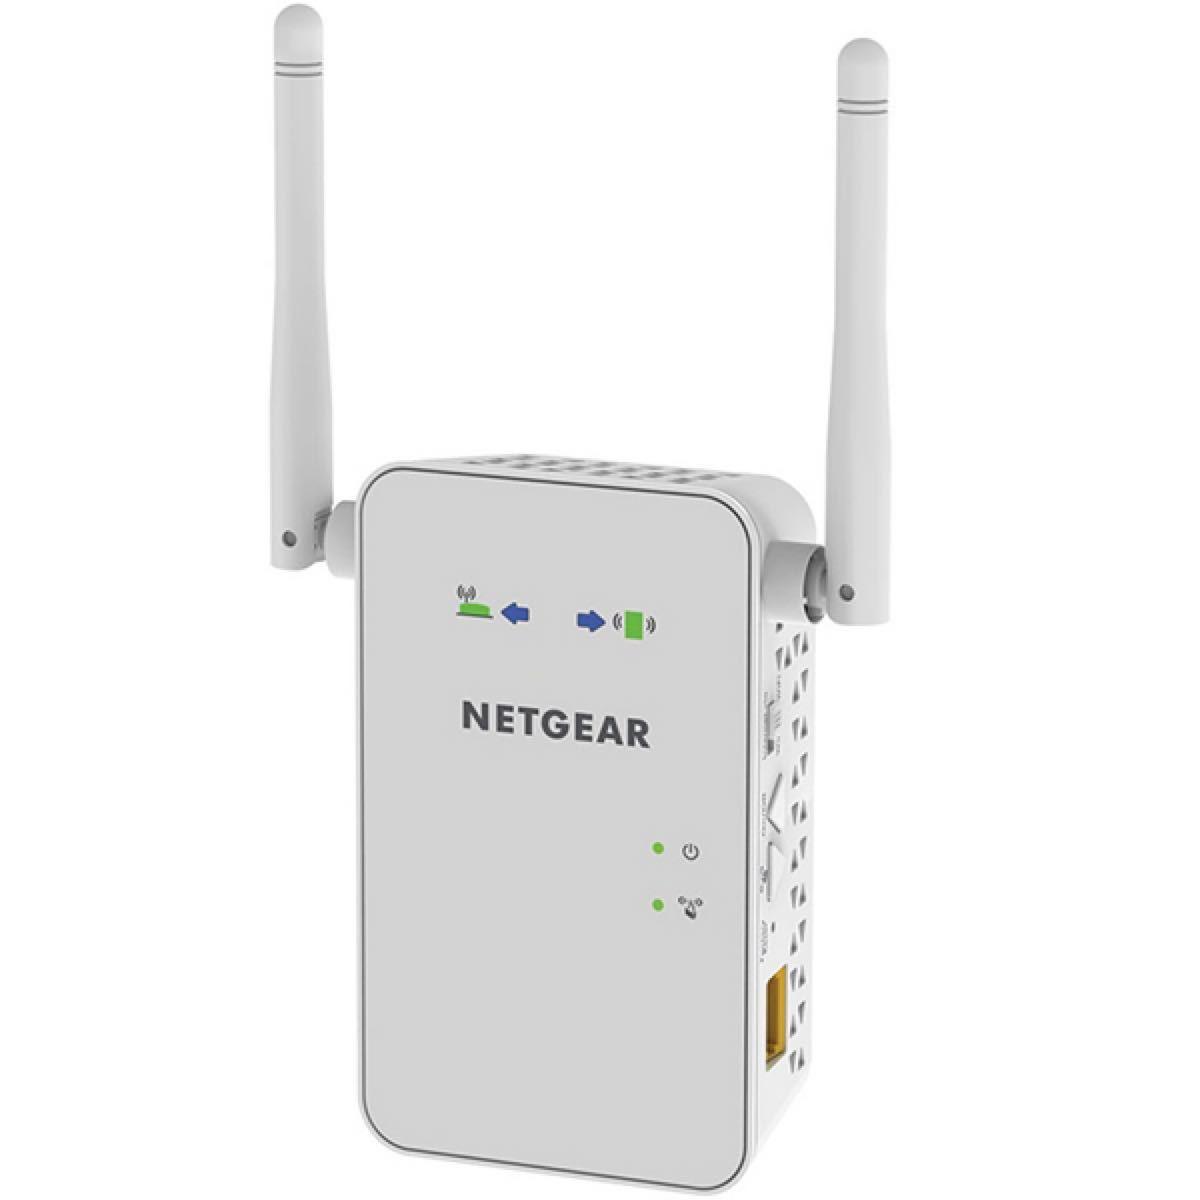 NETGEAR 無線LAN中継器 11ac対応 450+300Mbps 2.4GHz/5GHz EX6100-100JPS